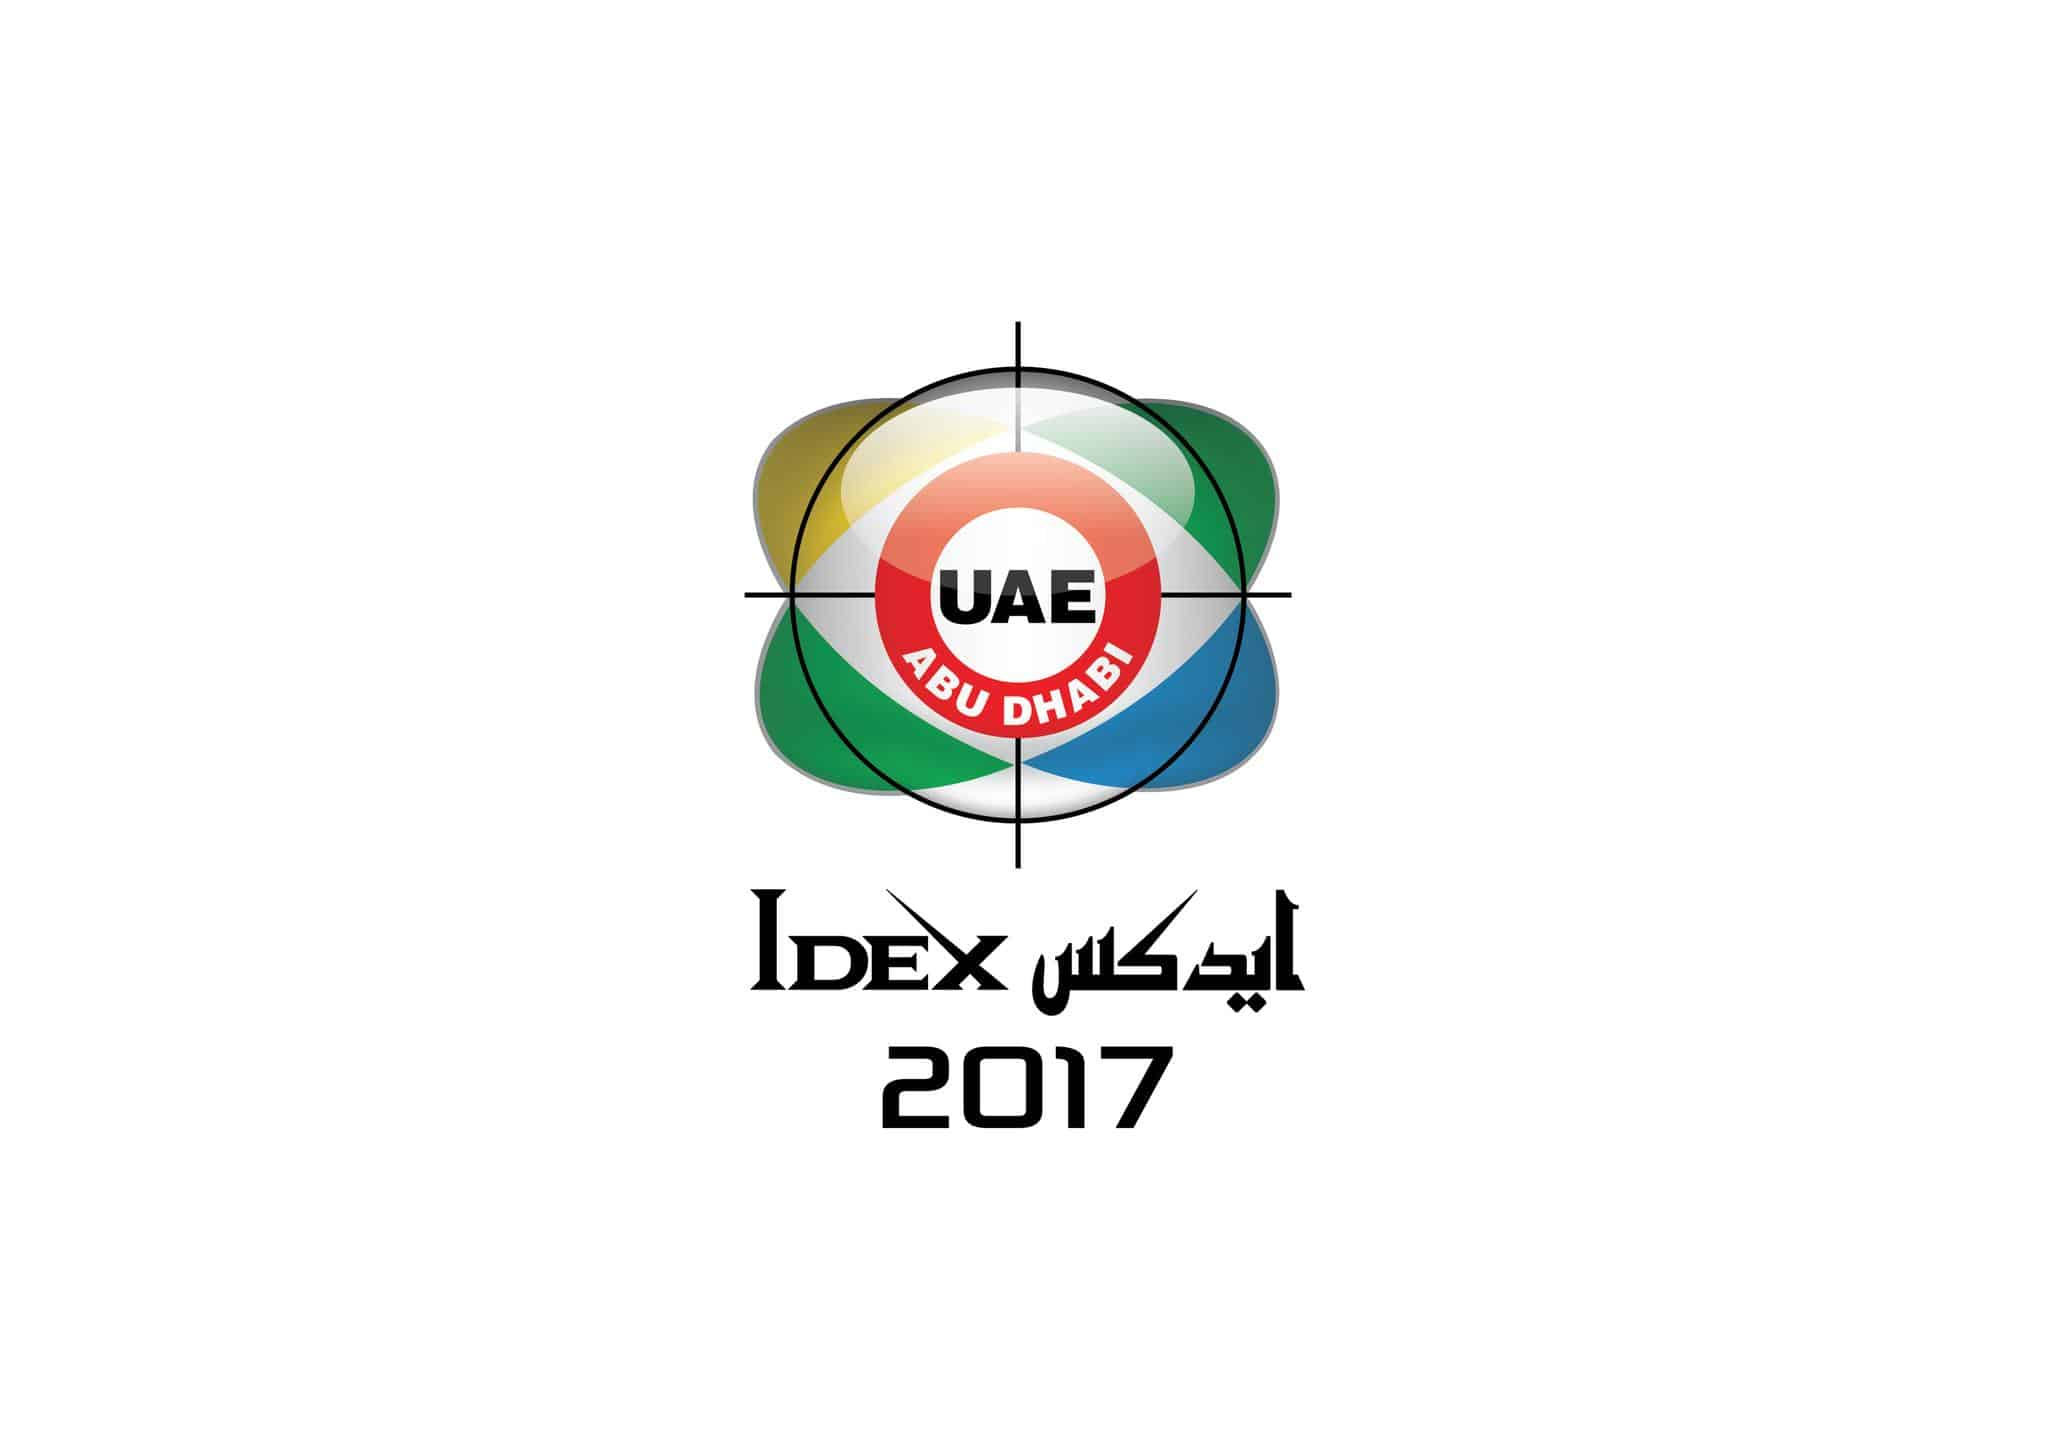 IDEX-2017-LOGO